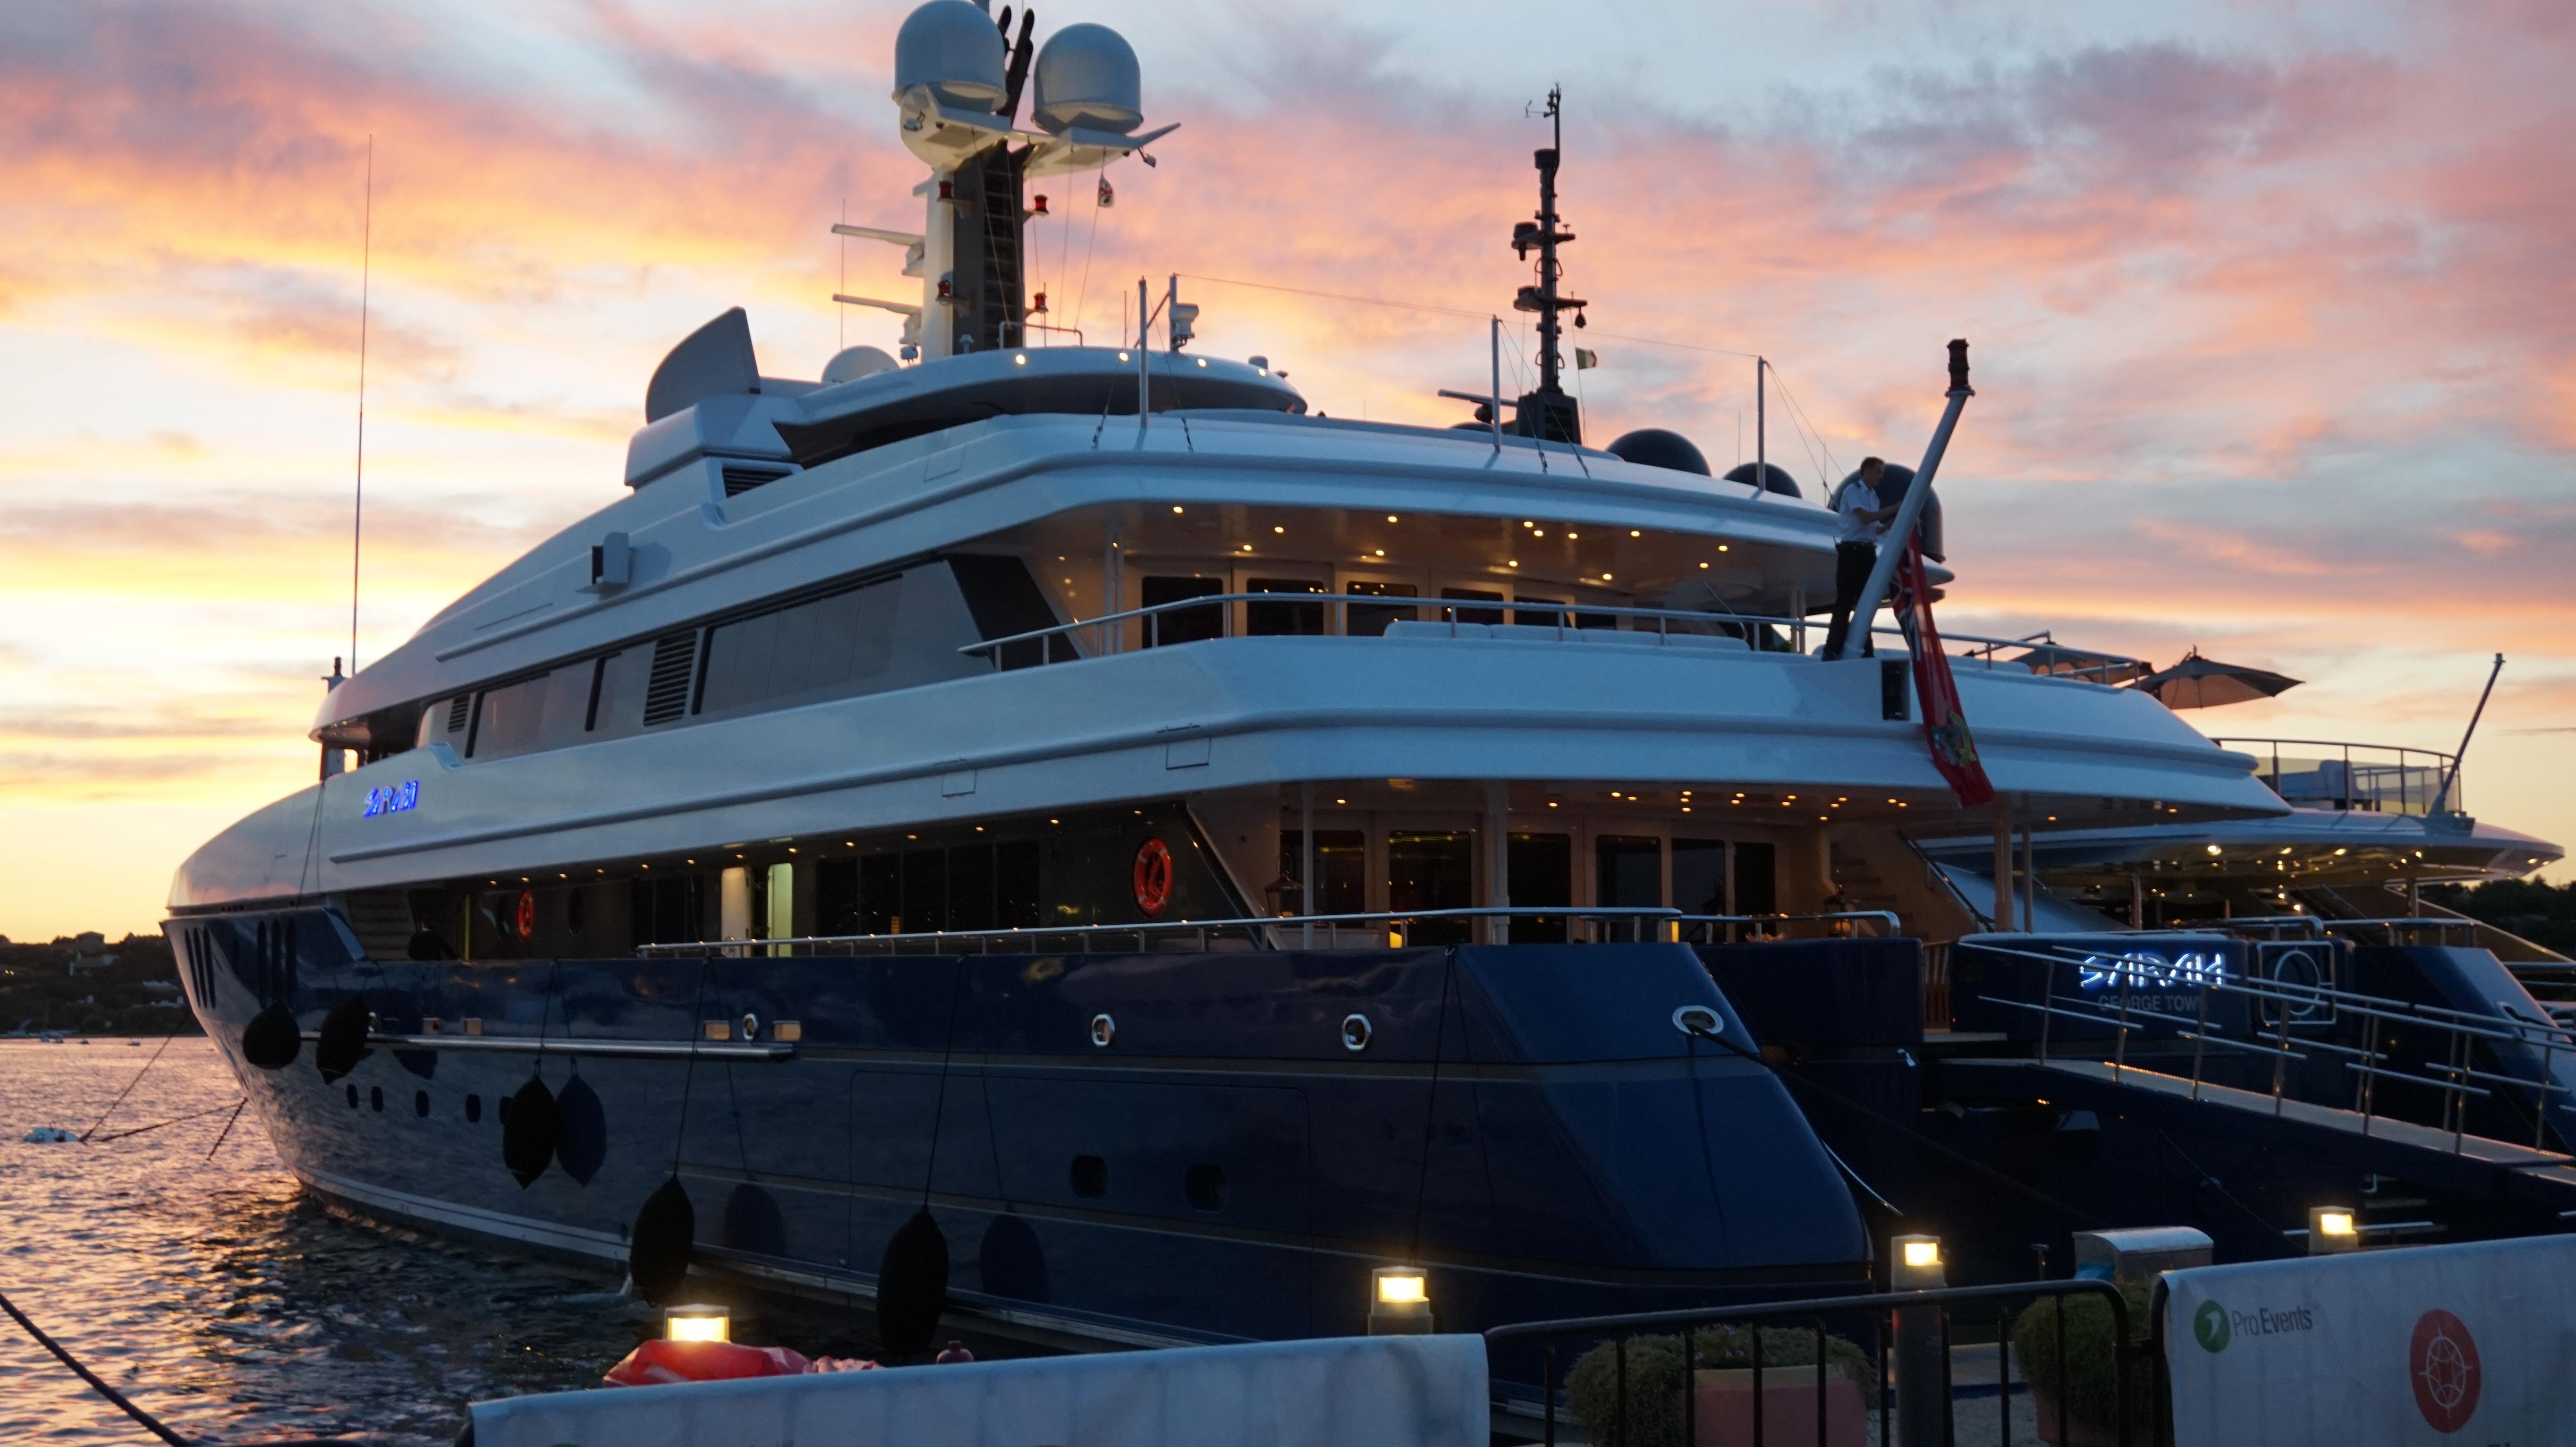 Sarah, 62m Amels Yacht in Porto Cervo